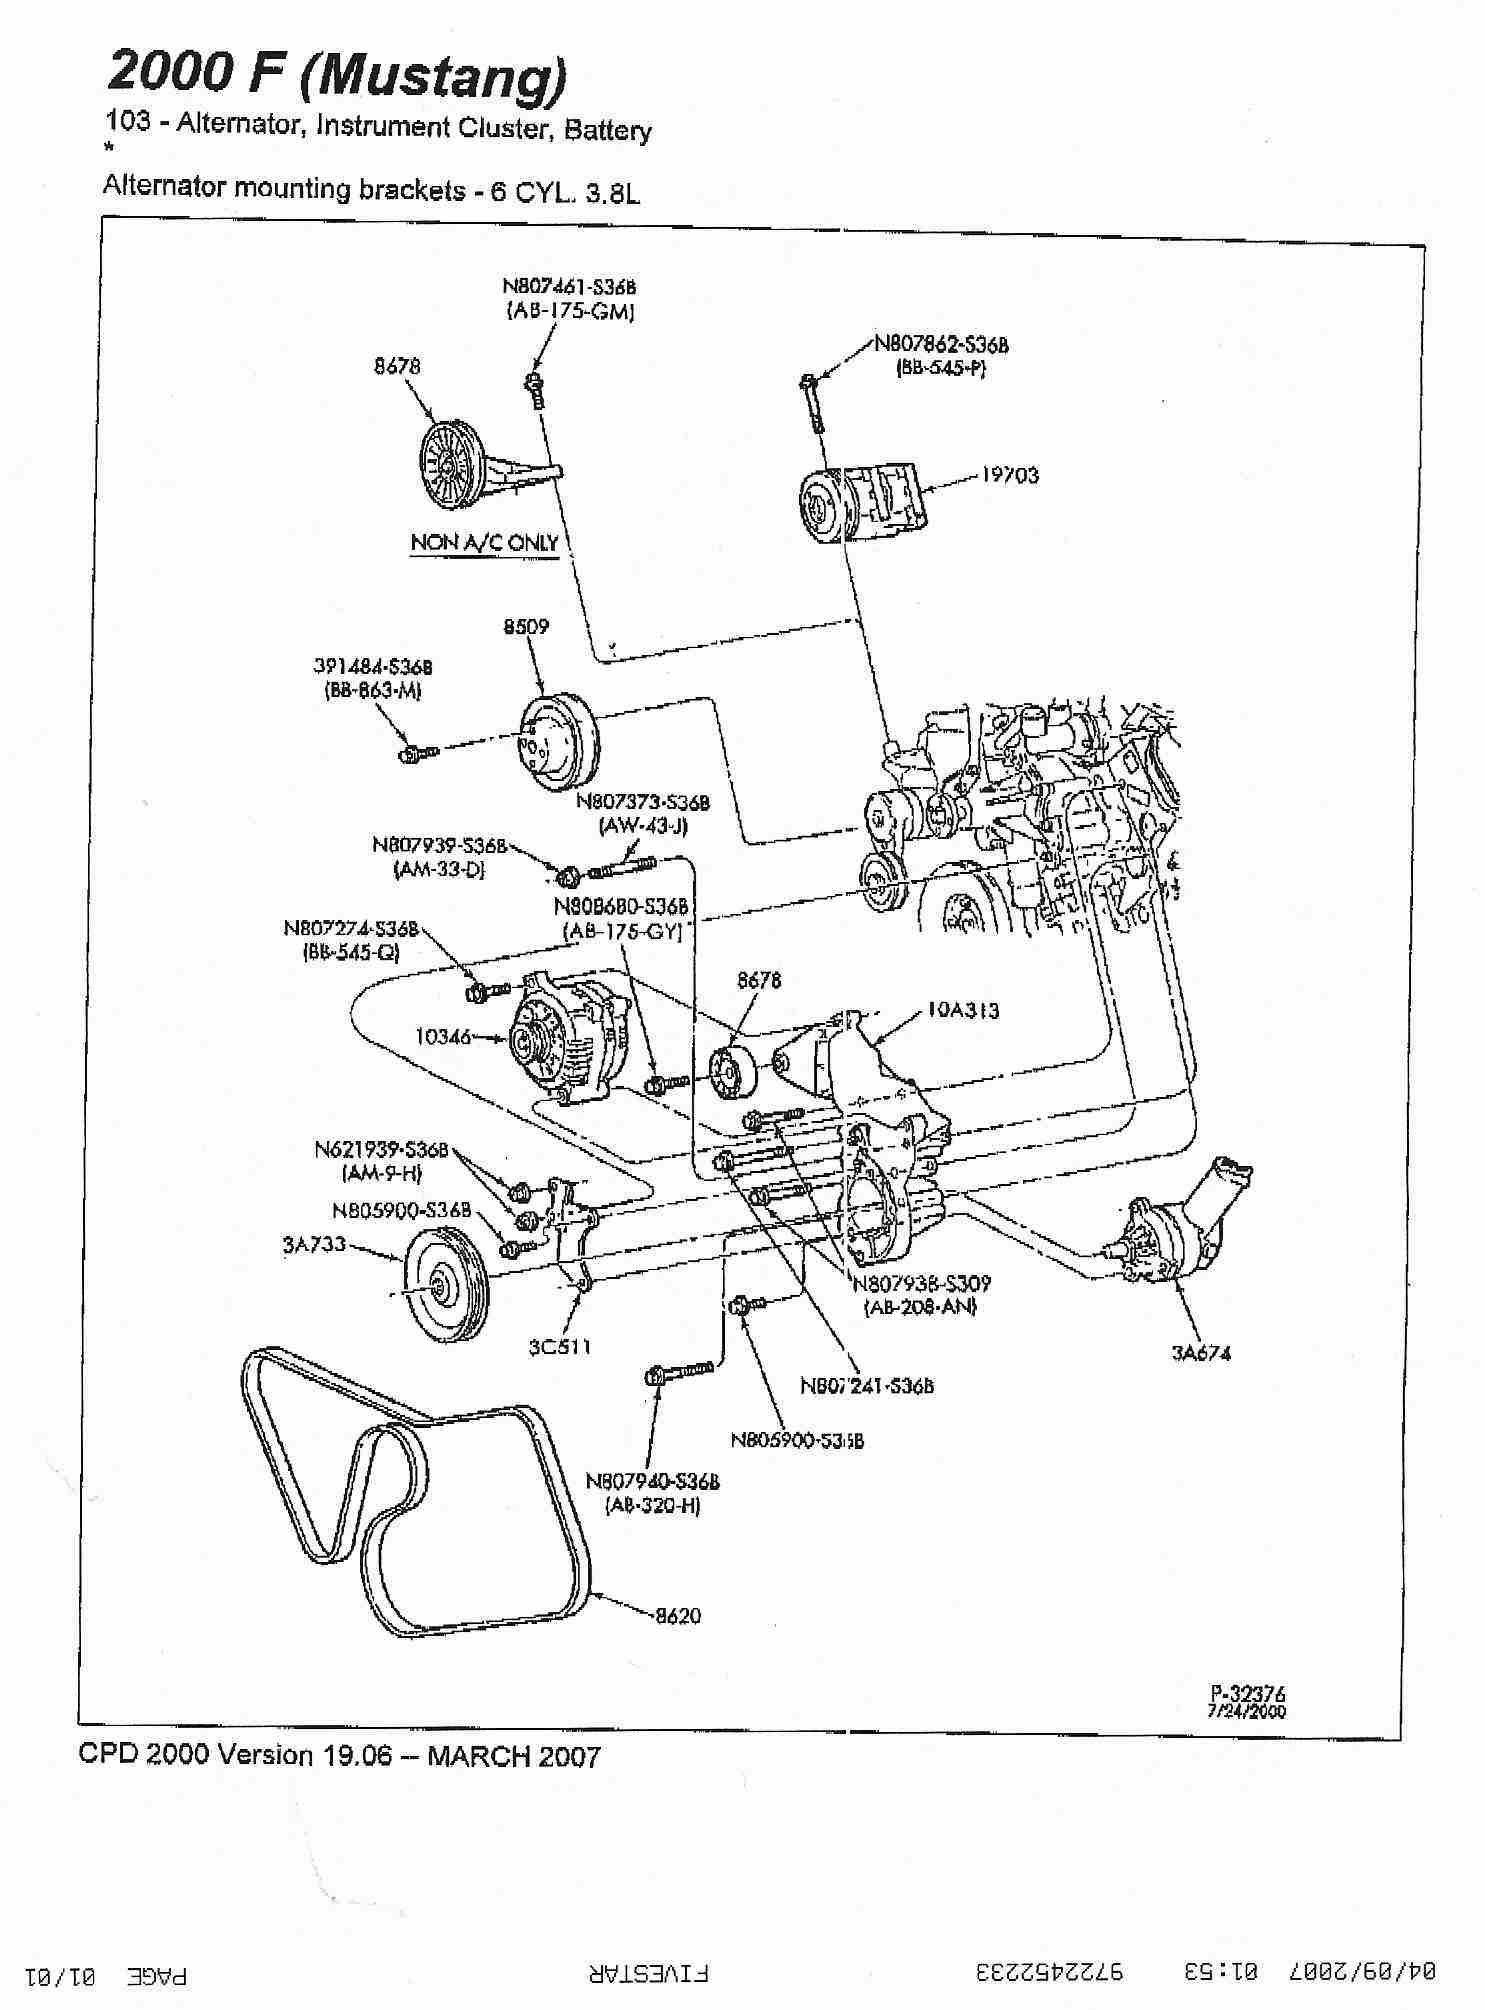 2003 Ford Mustang Wiring Diagram. 2003 ford taurus wiring